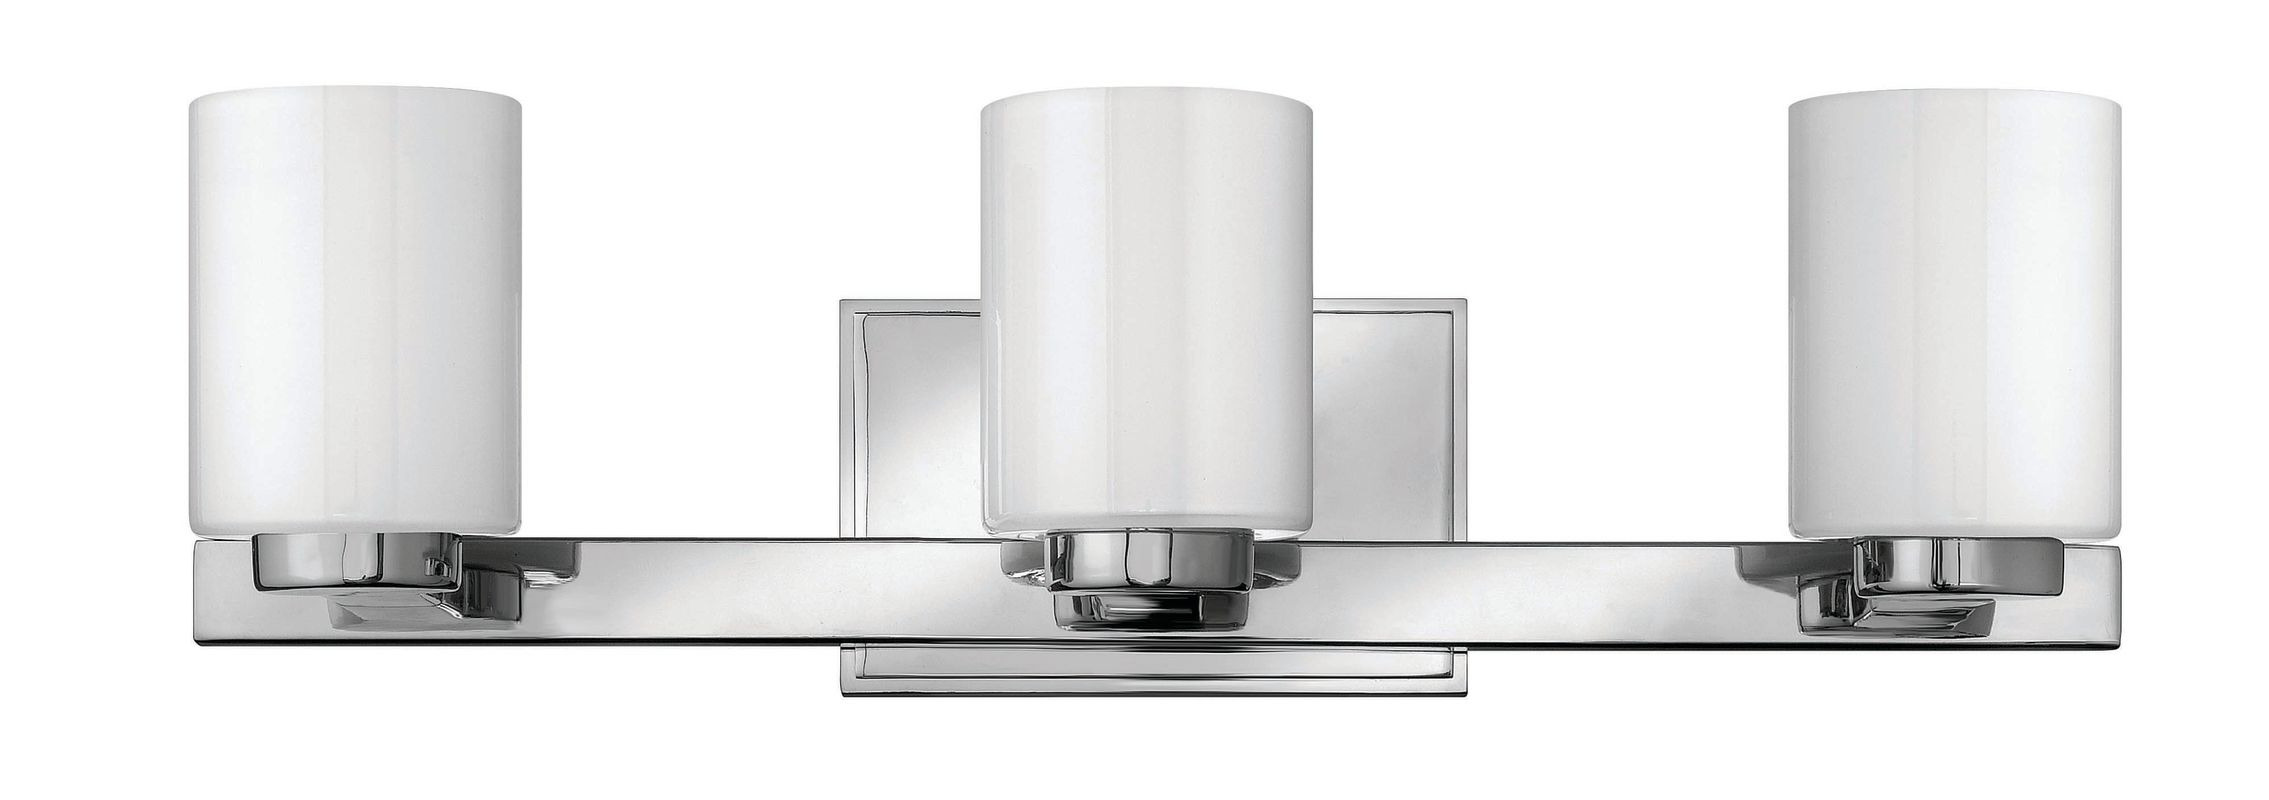 Hinkley Lighting 5053CM Chrome Contemporary Miley Bathroom Light